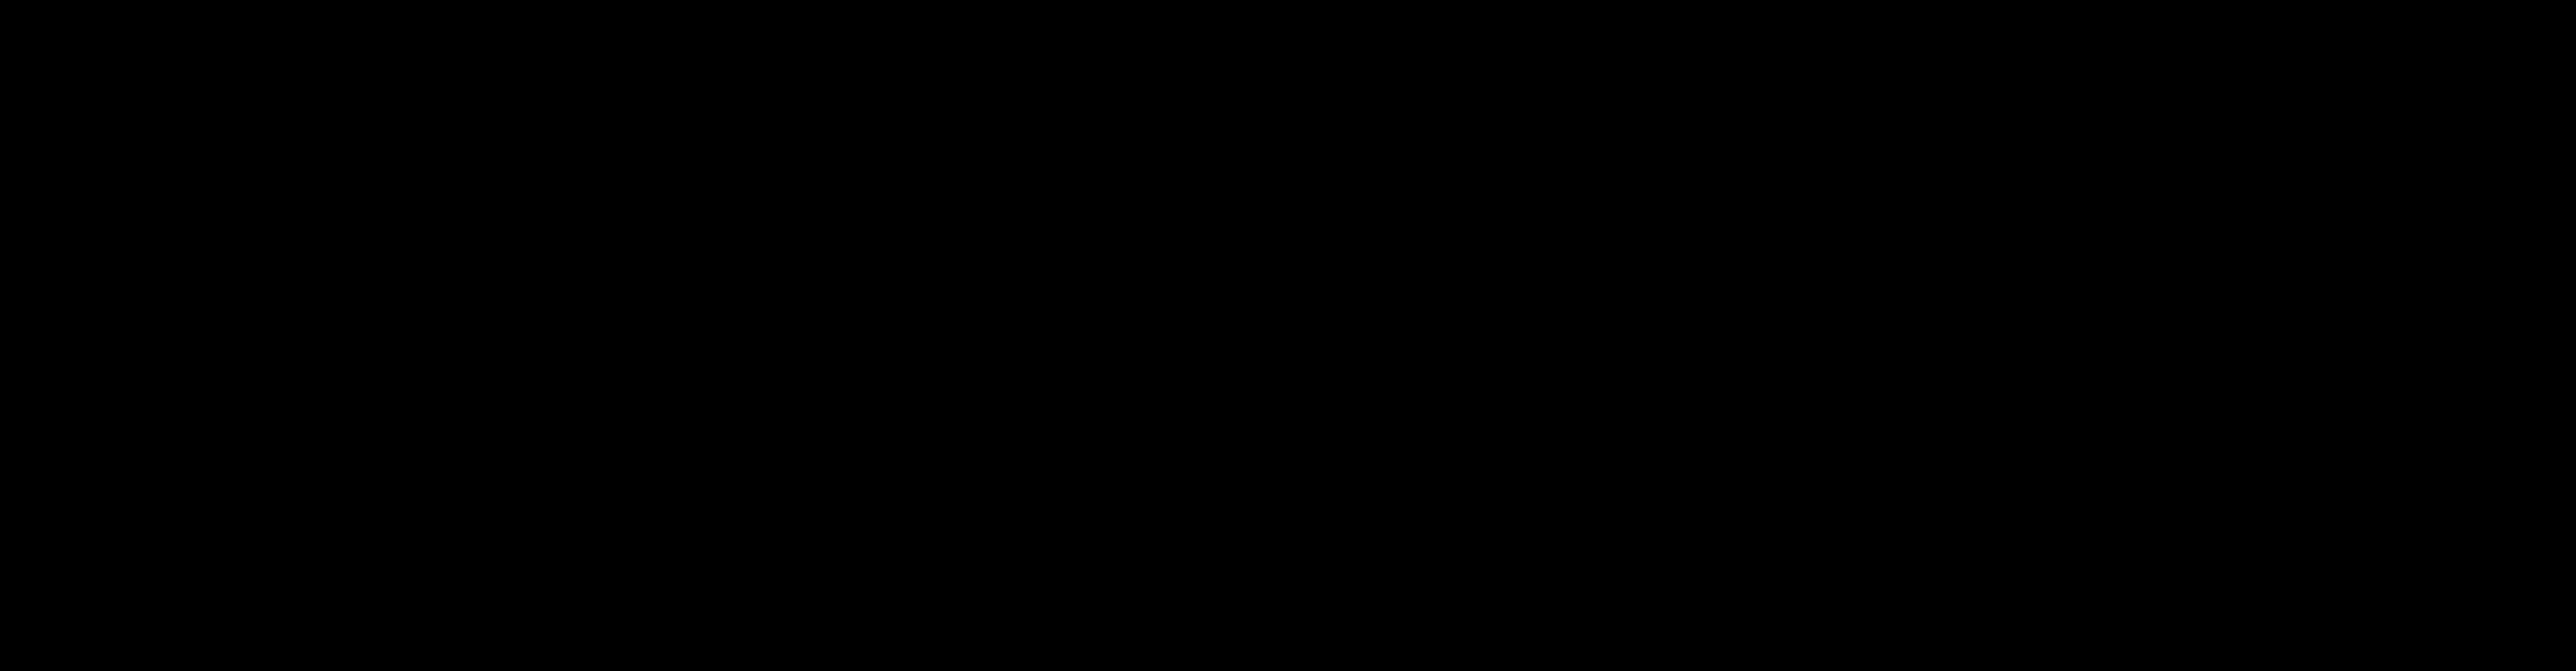 SLC-(+)-Biotin hydrazide